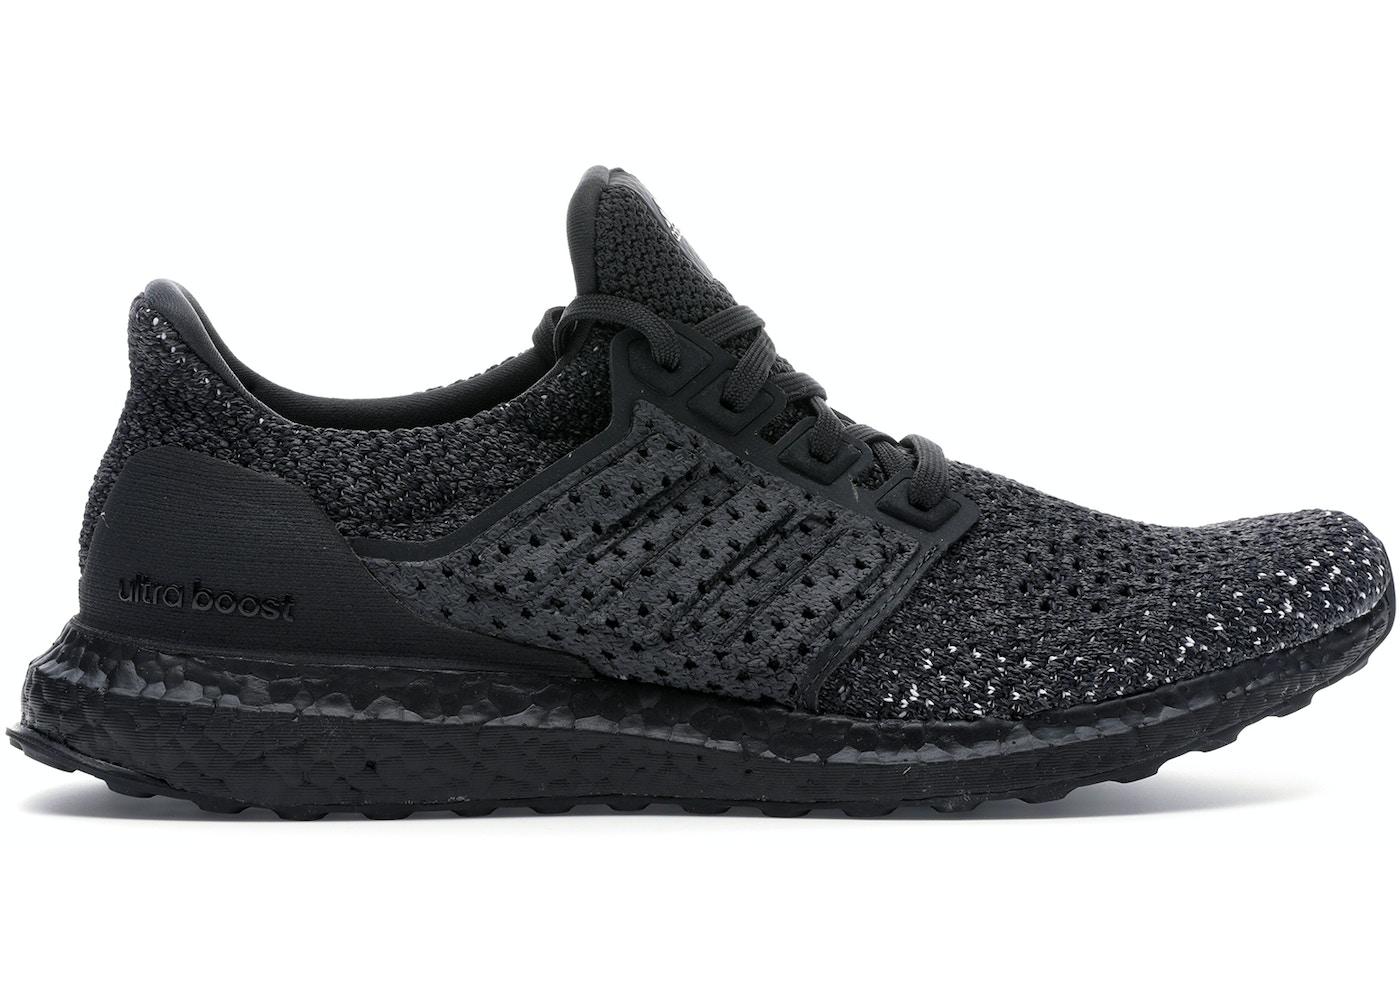 big sale e6b12 52890 adidas Ultra Boost Clima Black - CQ0022